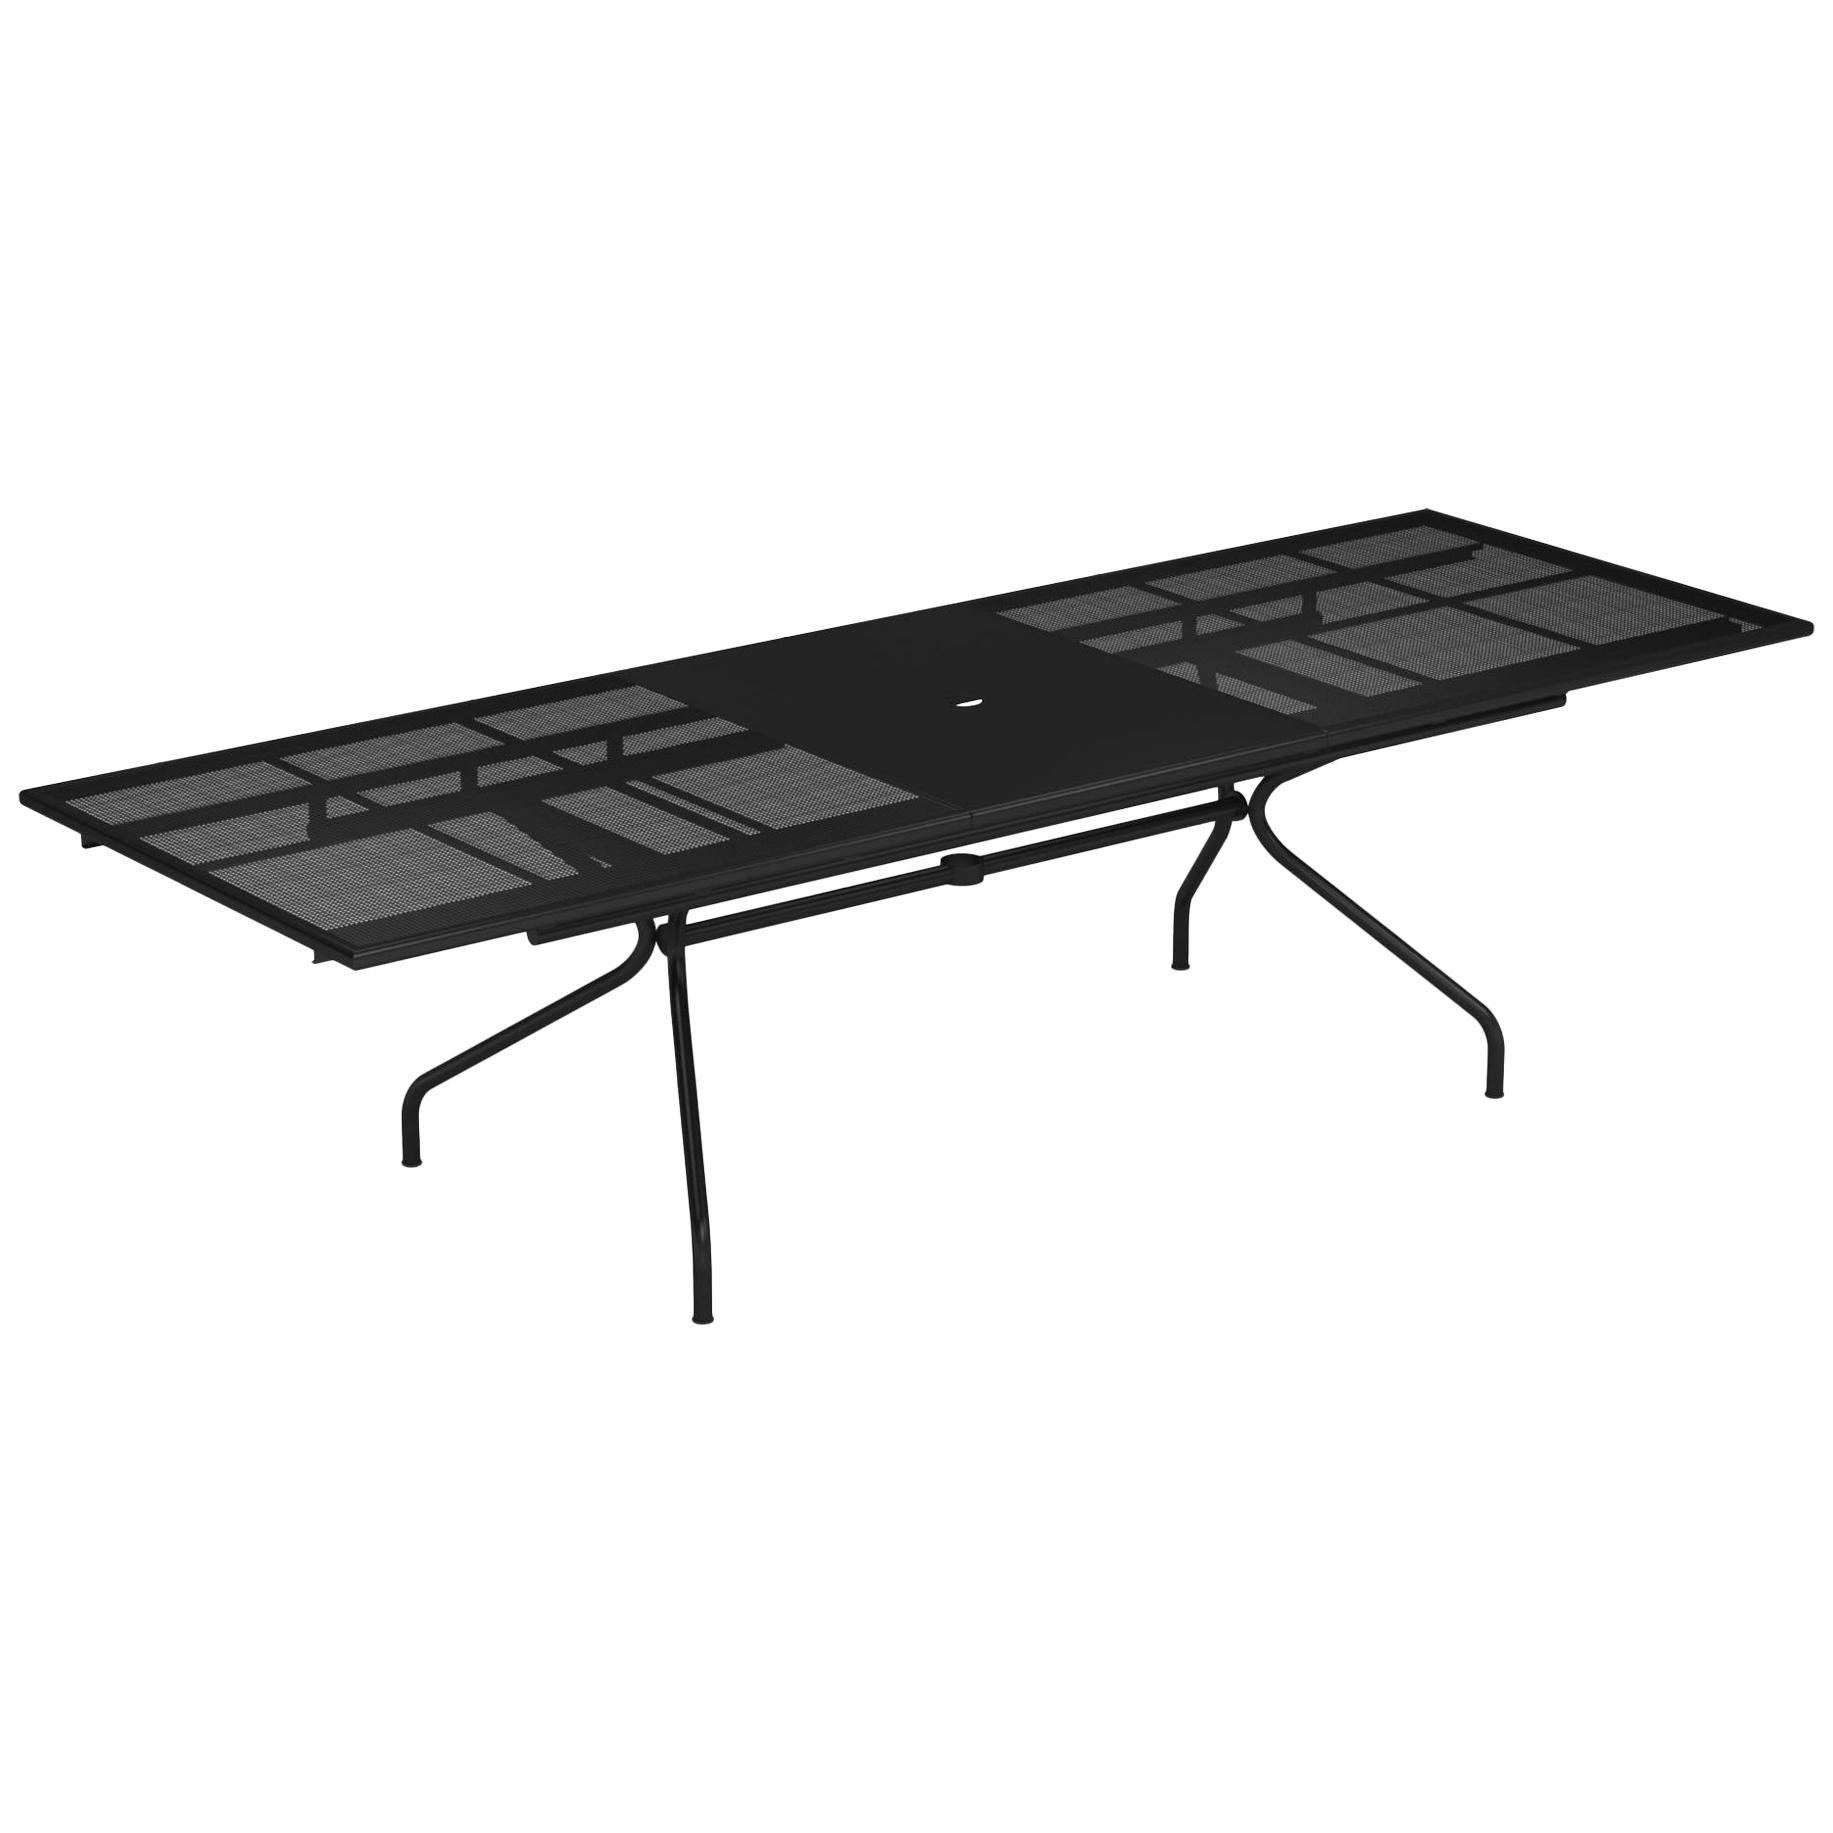 Steel EMU Athena 8+2/4 Seats Extensible Table